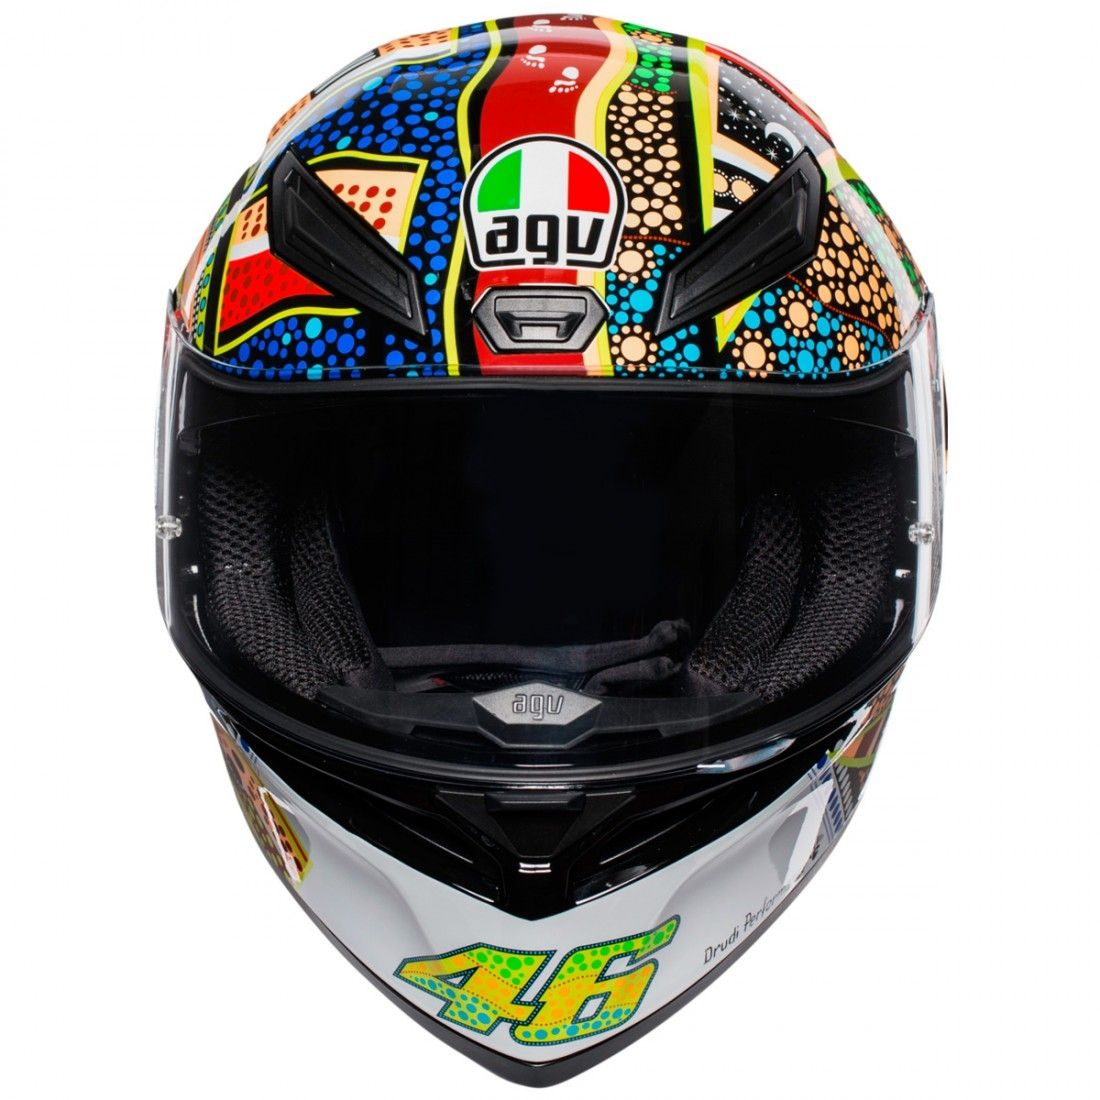 Capacete AGV K-1 DREAMTIME Valentino Rossi (k1)  - Motosports